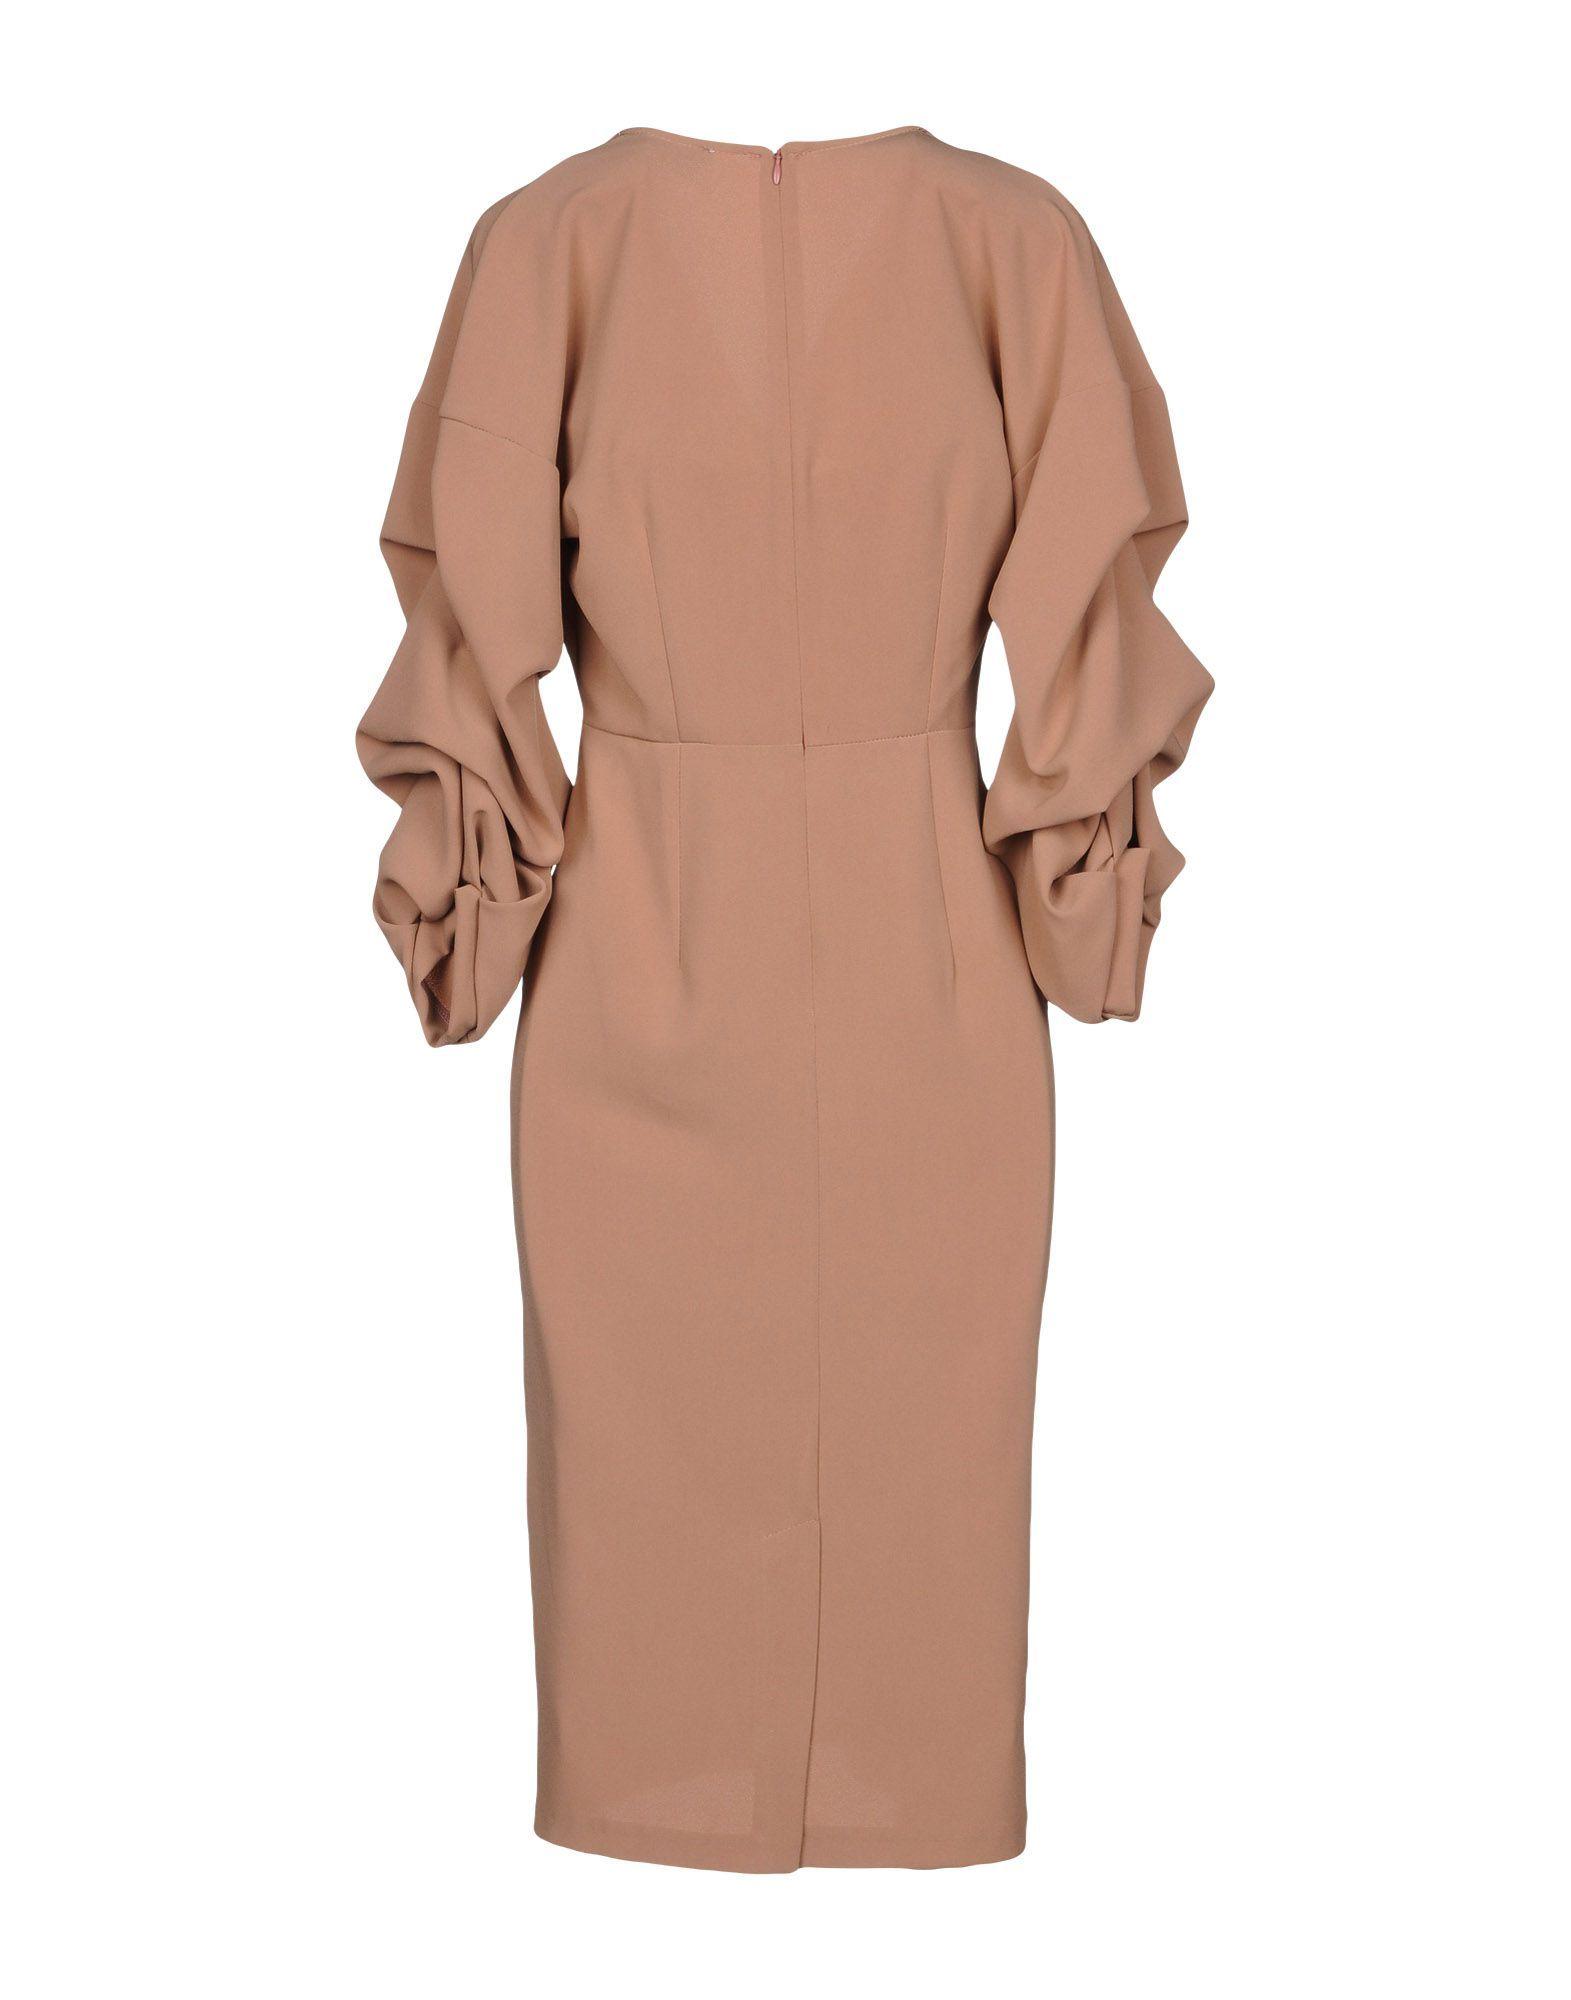 Kaos Pastel Pink Long Sleeve Dress